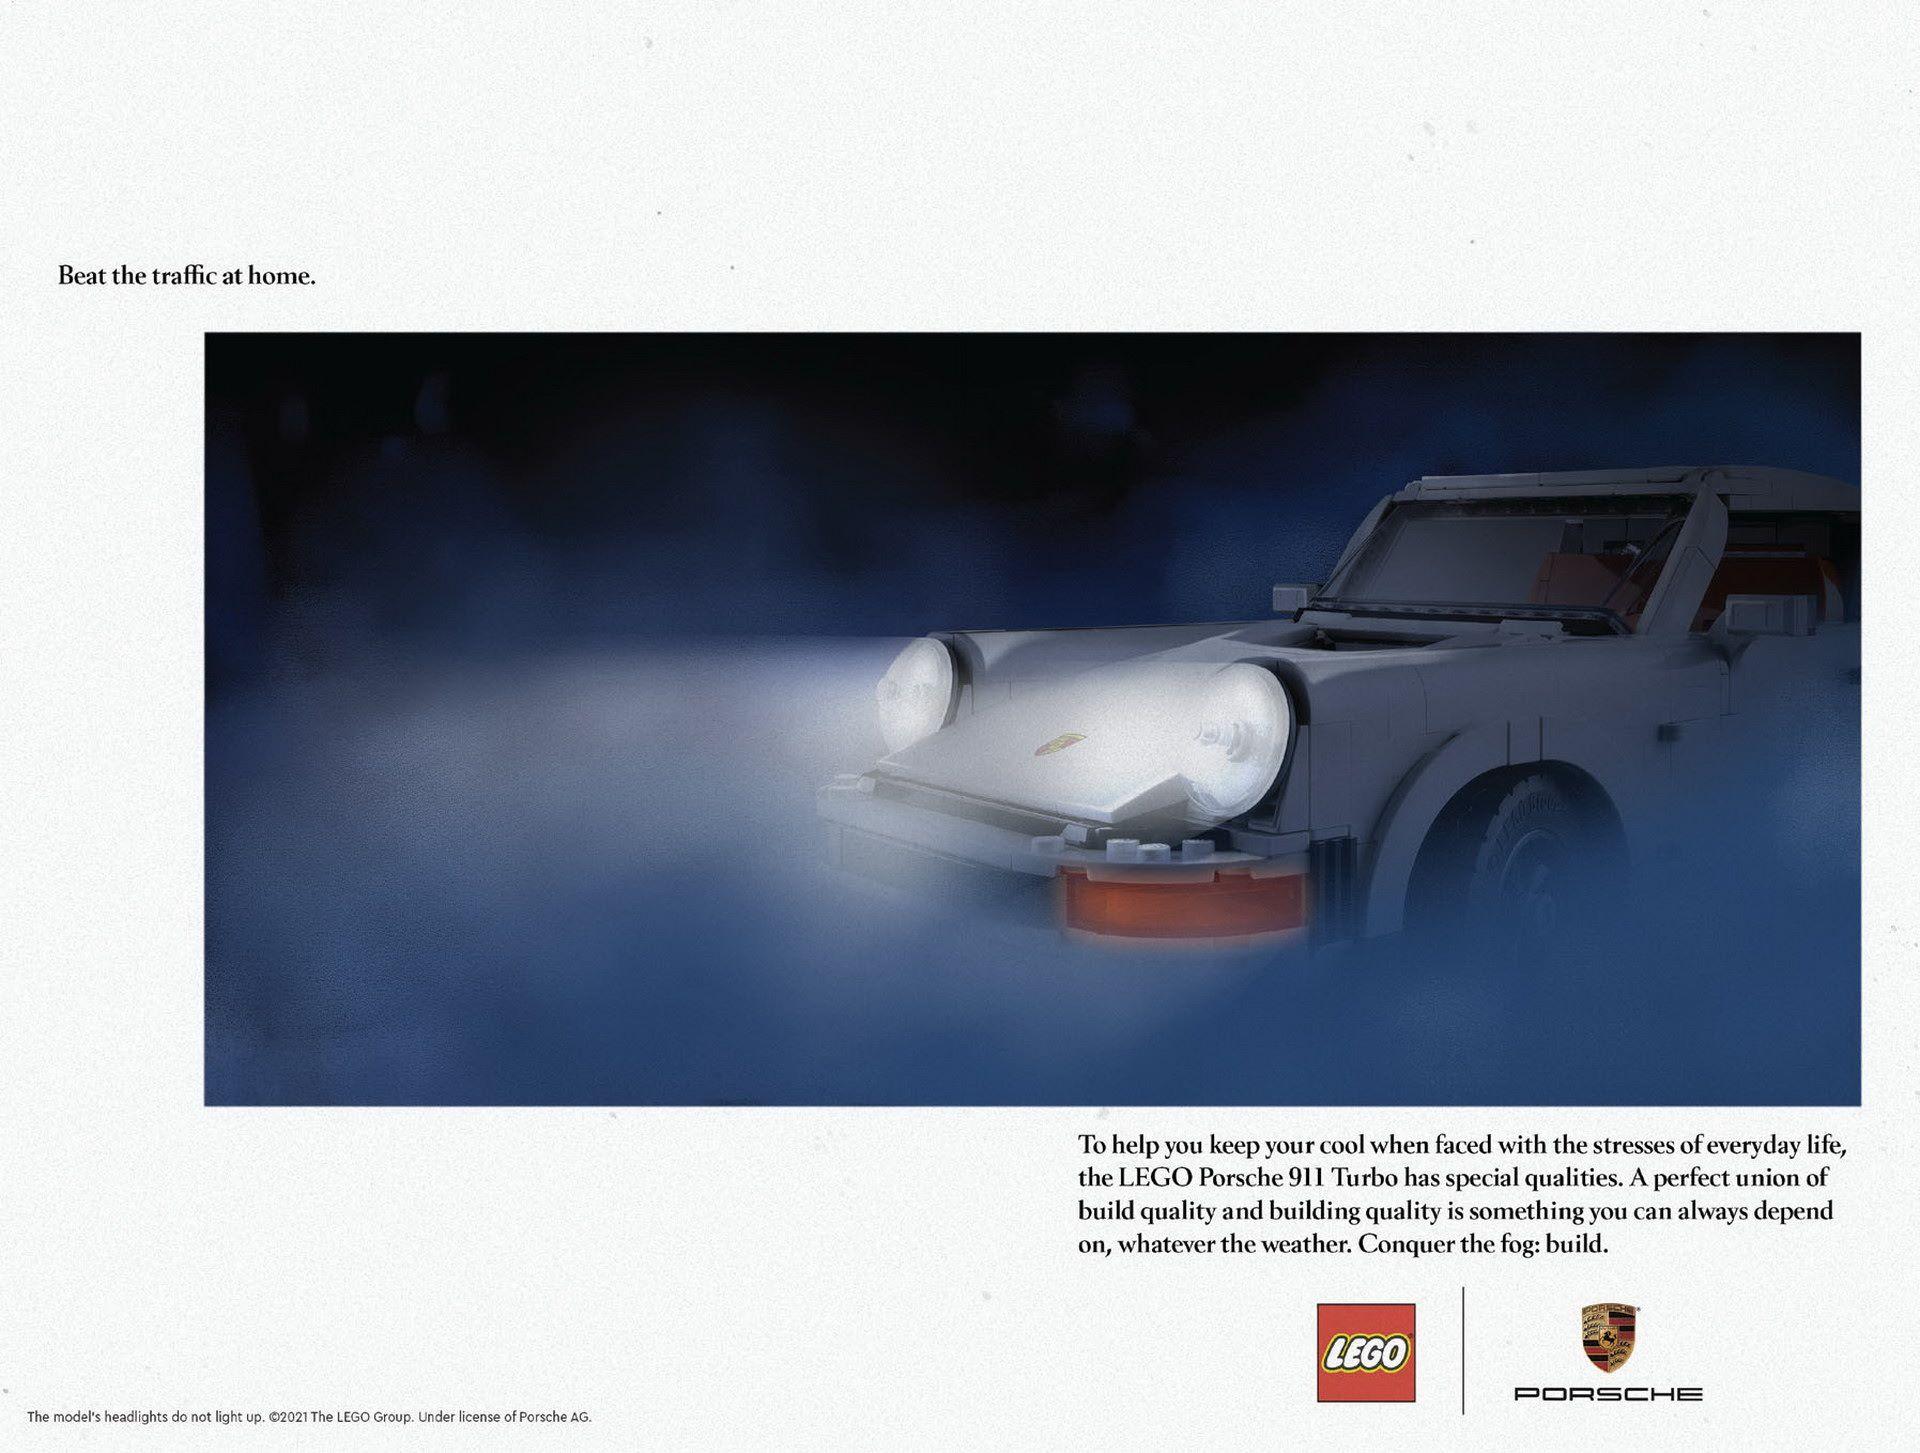 Porsche-911-Turbo-and-Targa-kit-16